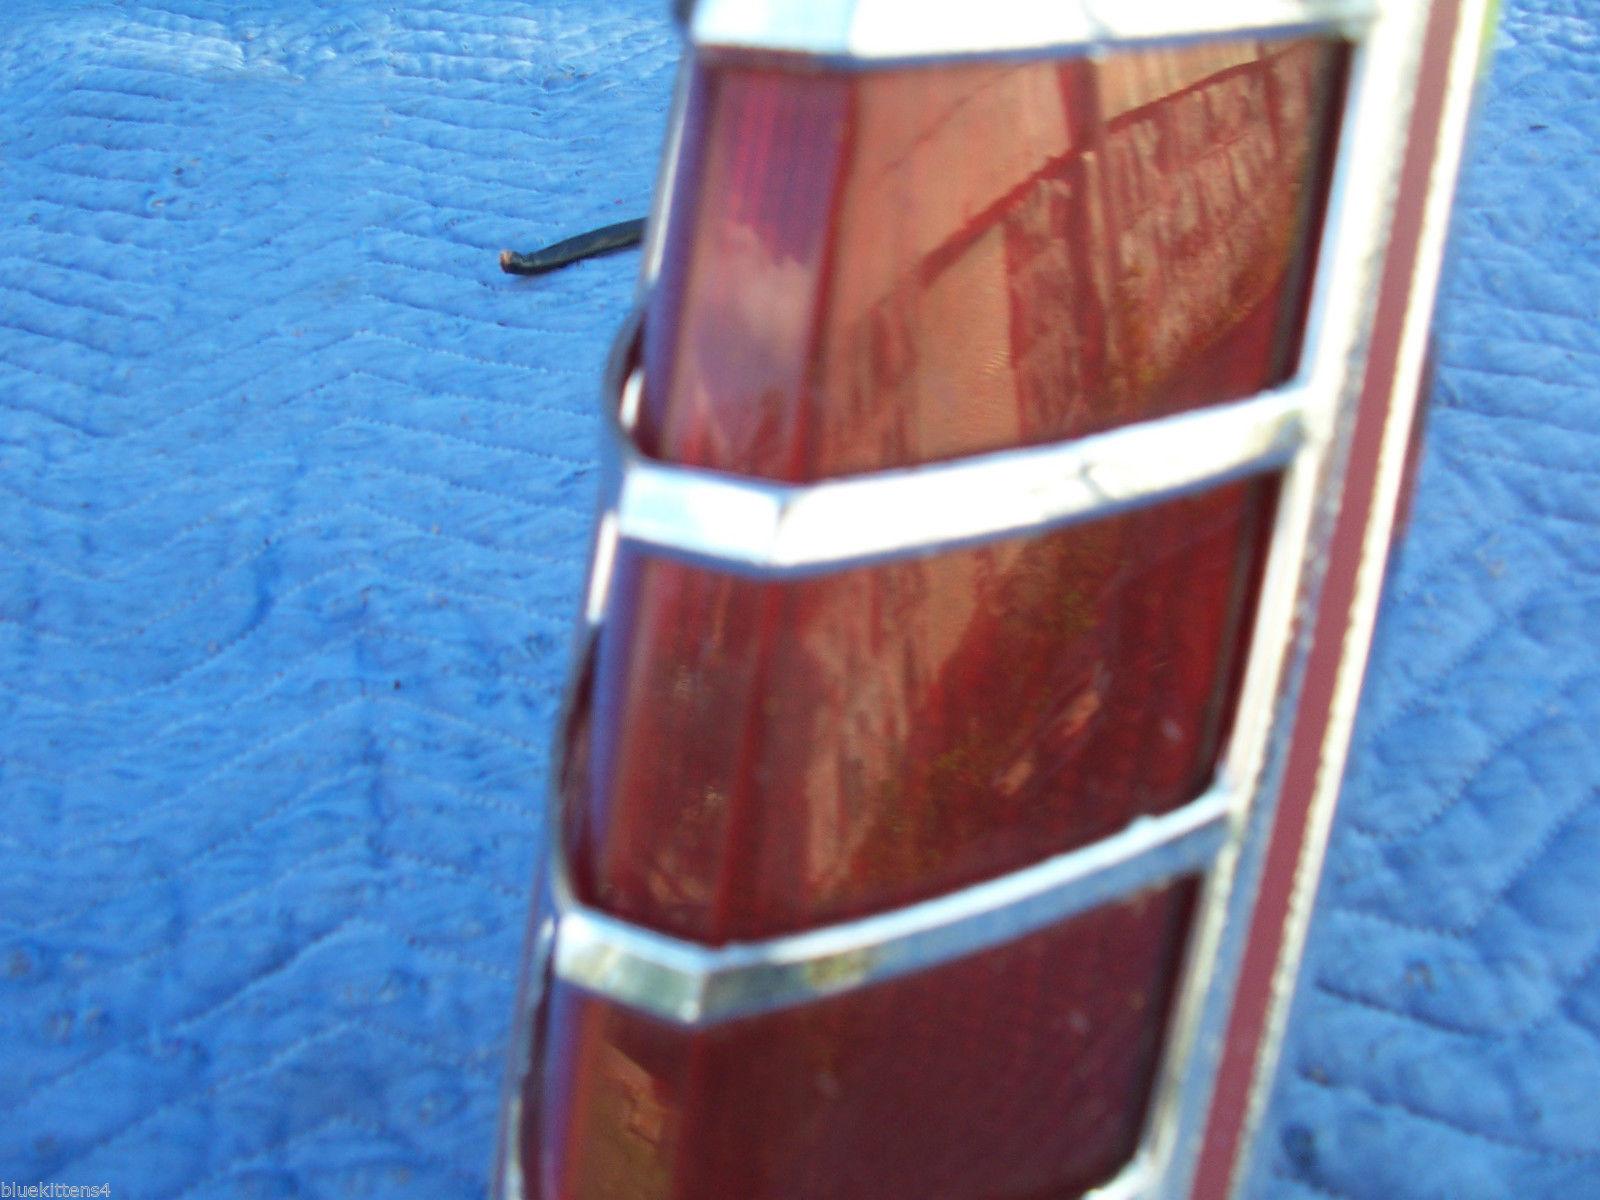 1978 MARK V LEFT CRACKED TAILLIGHT OEM USED ORIGINAL LINCOLN FORD PART 1979 1977 image 4